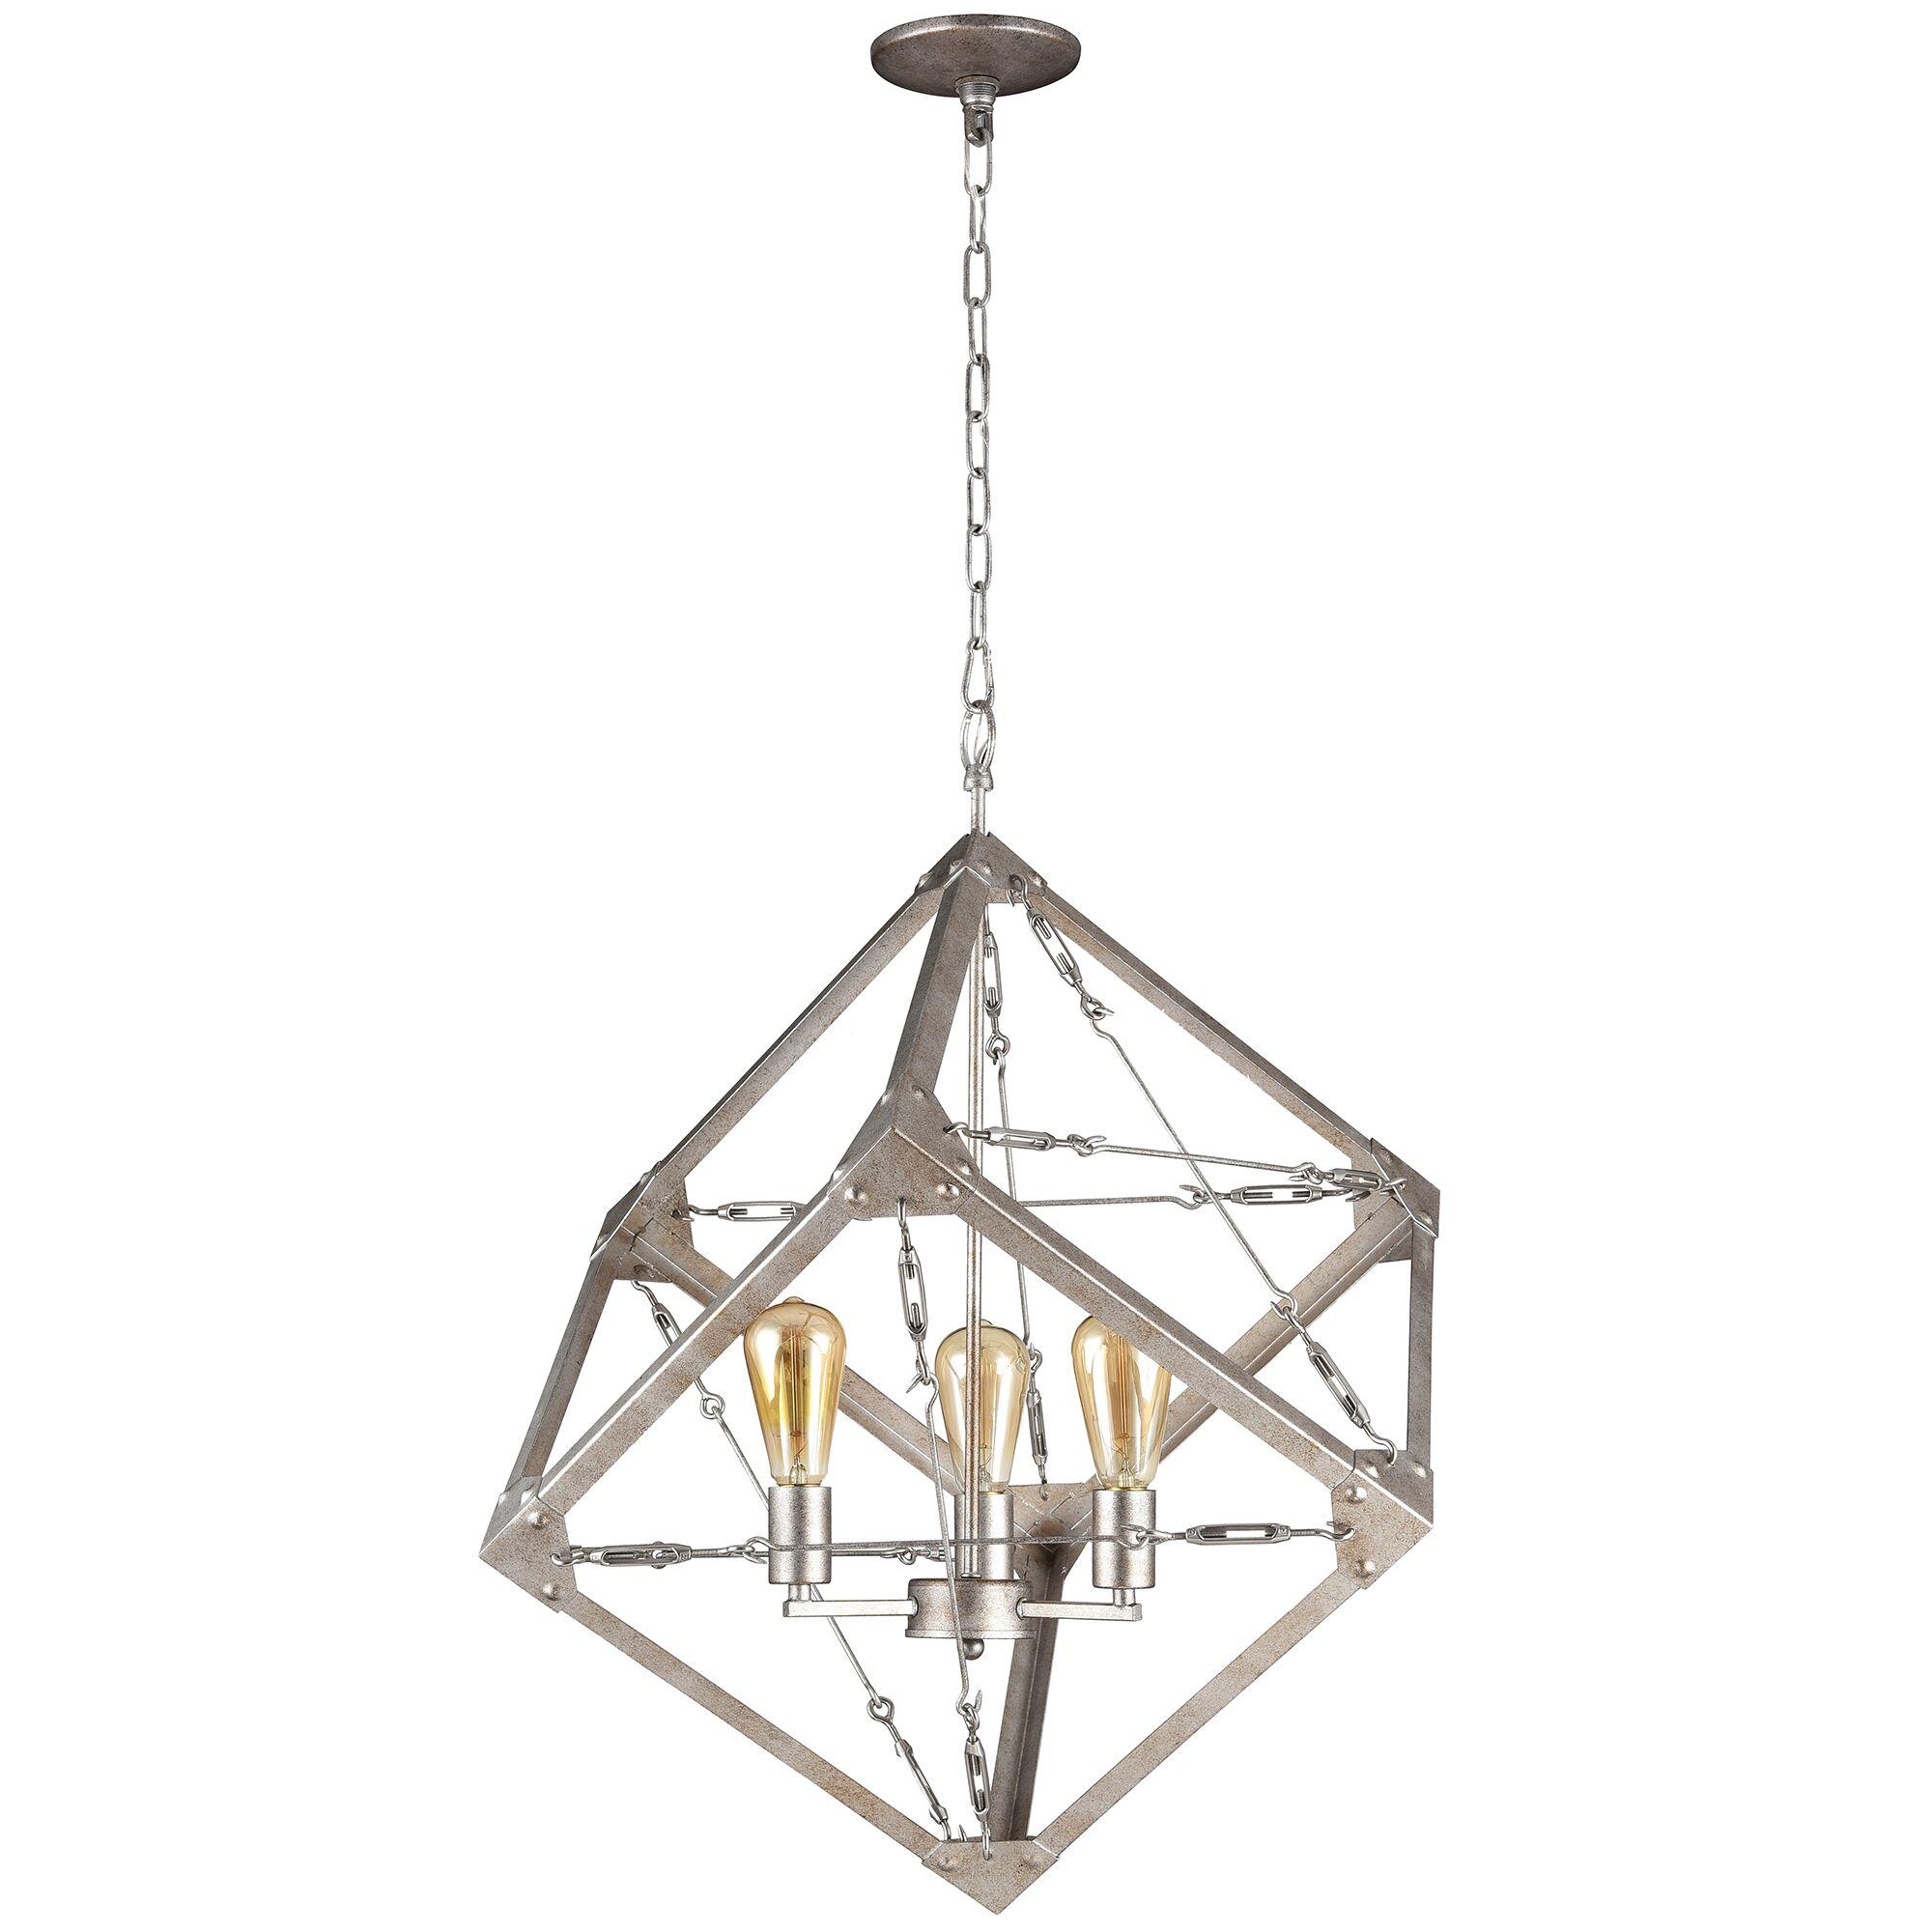 Askew 3-Light Square/Rectangle Chandelier